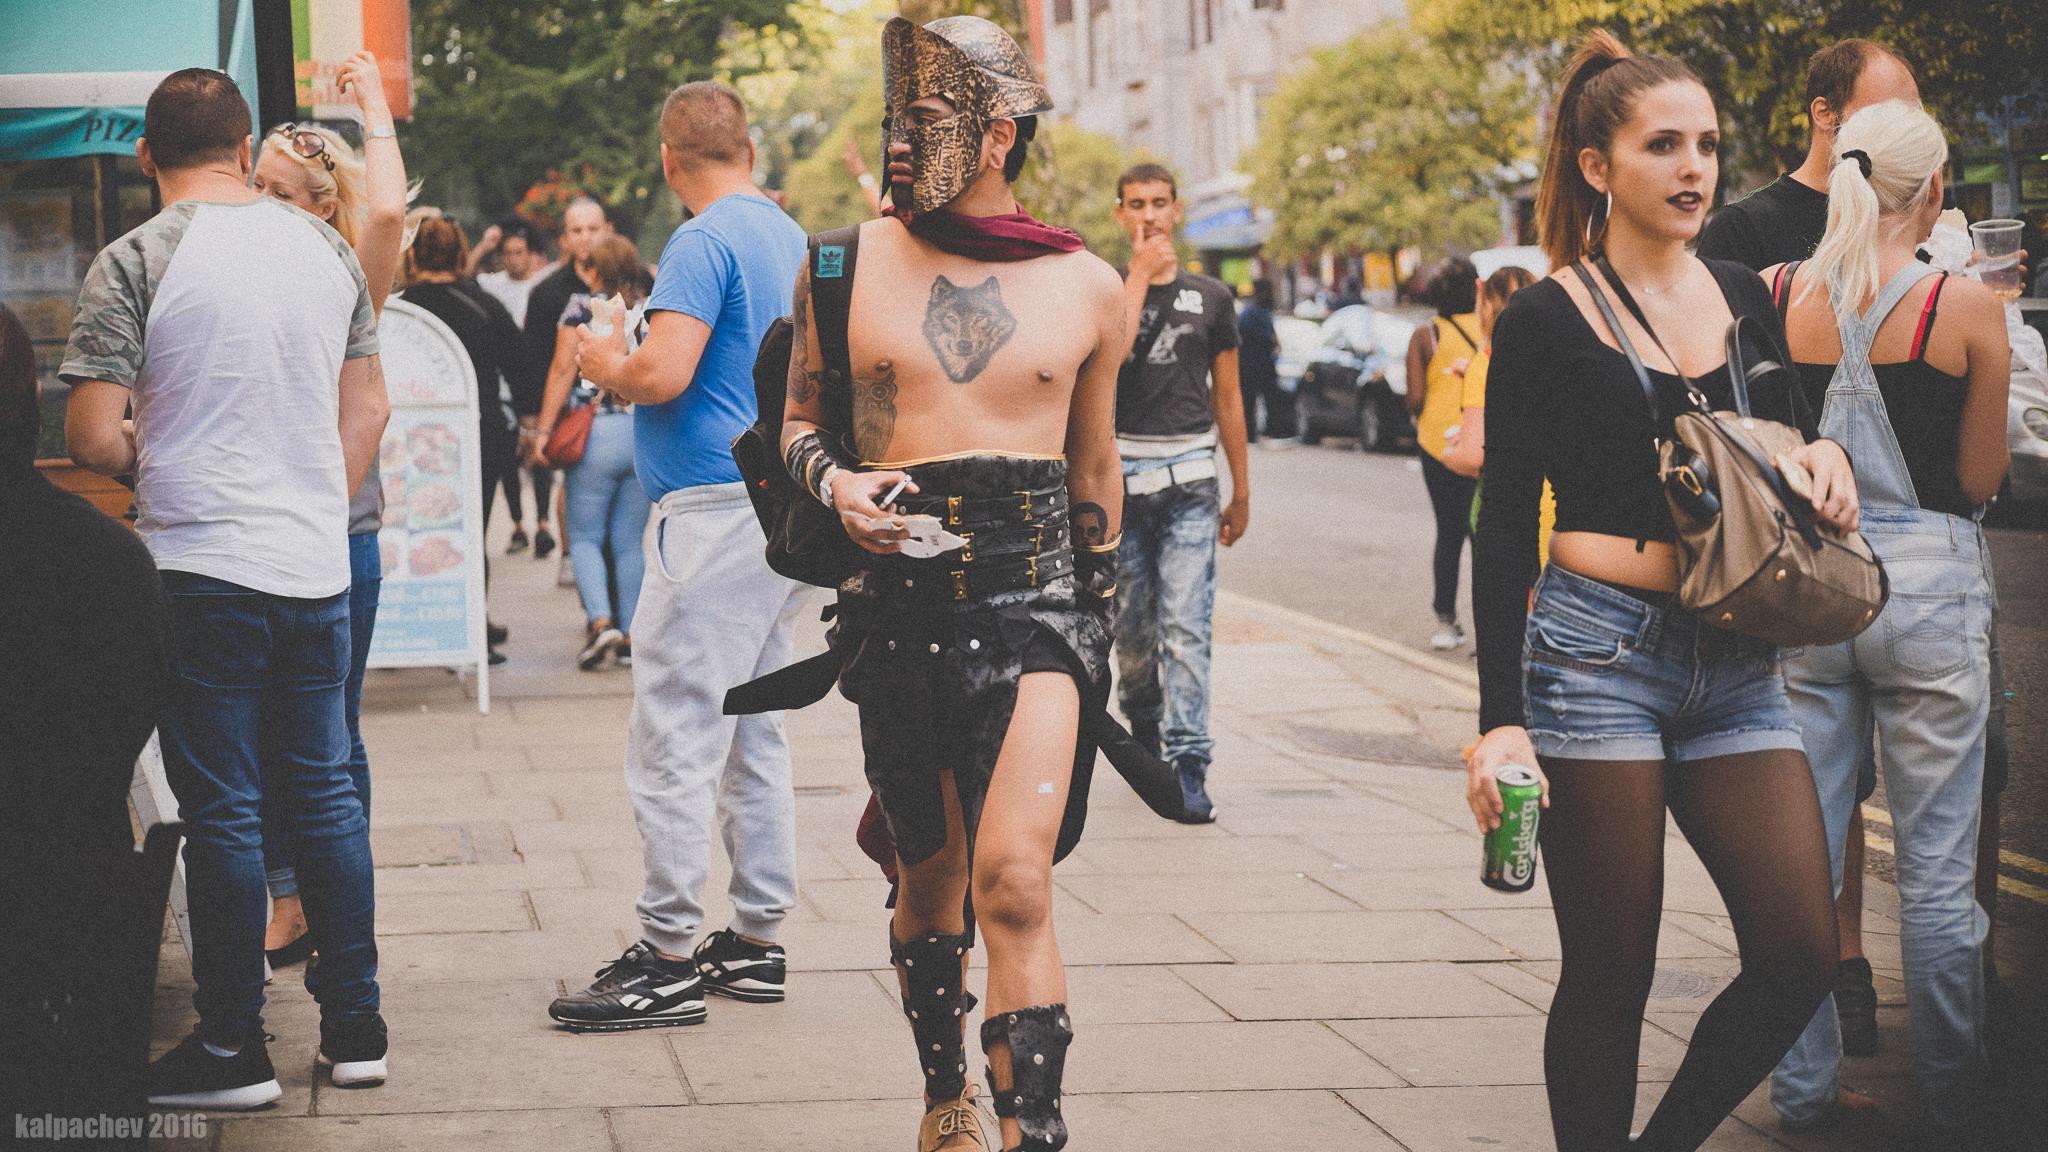 Streets of London #london #street #streetphotography